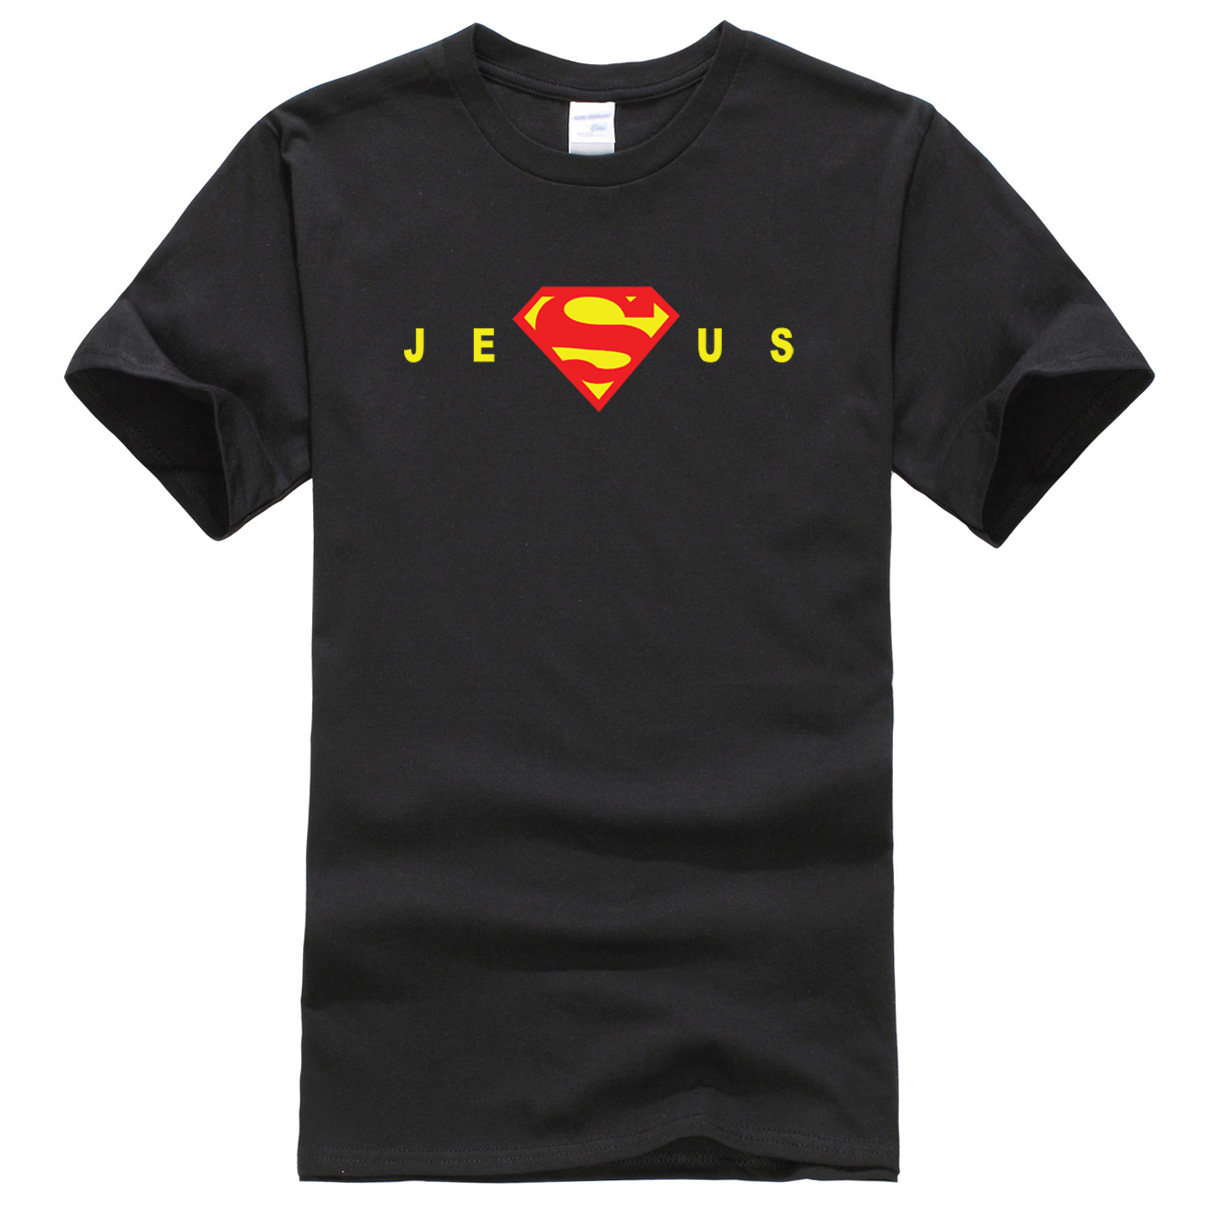 Hot men's T-shirt 2019 Men Super Jesus Christ Homeboy Superstar T Shirt jersey t shirt men harajuku homme hip hop brand-clothing